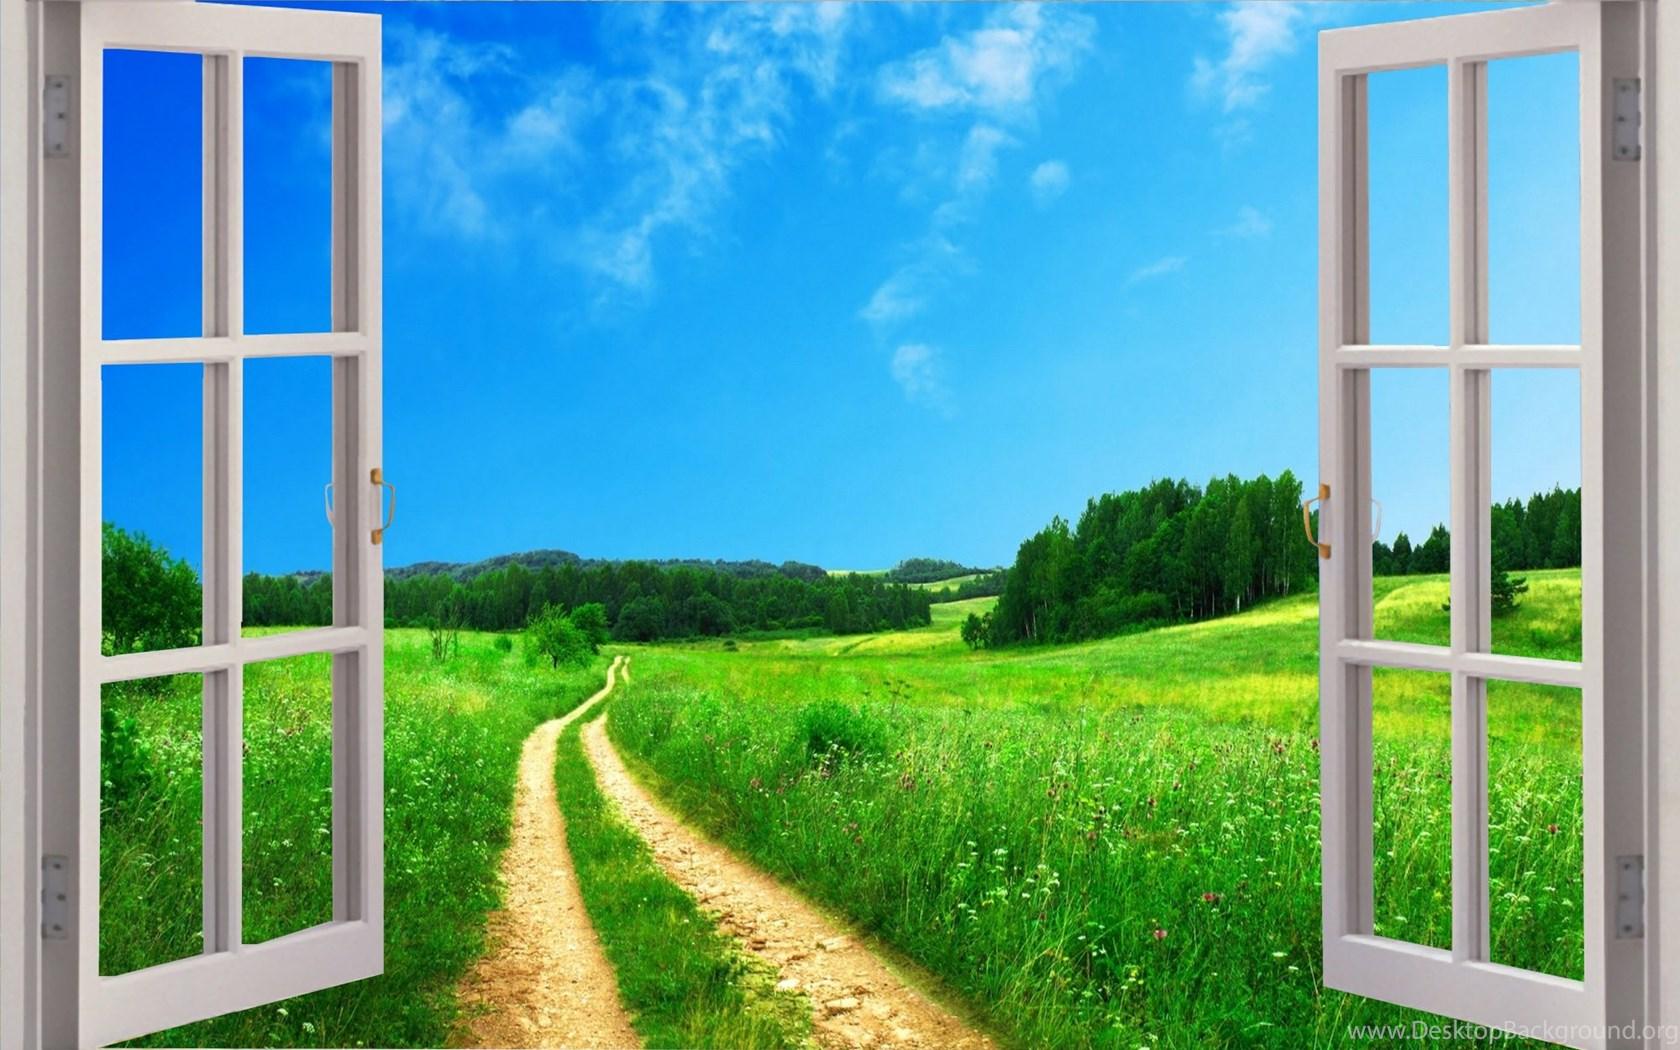 картинка фон окна лишних слов картинкой